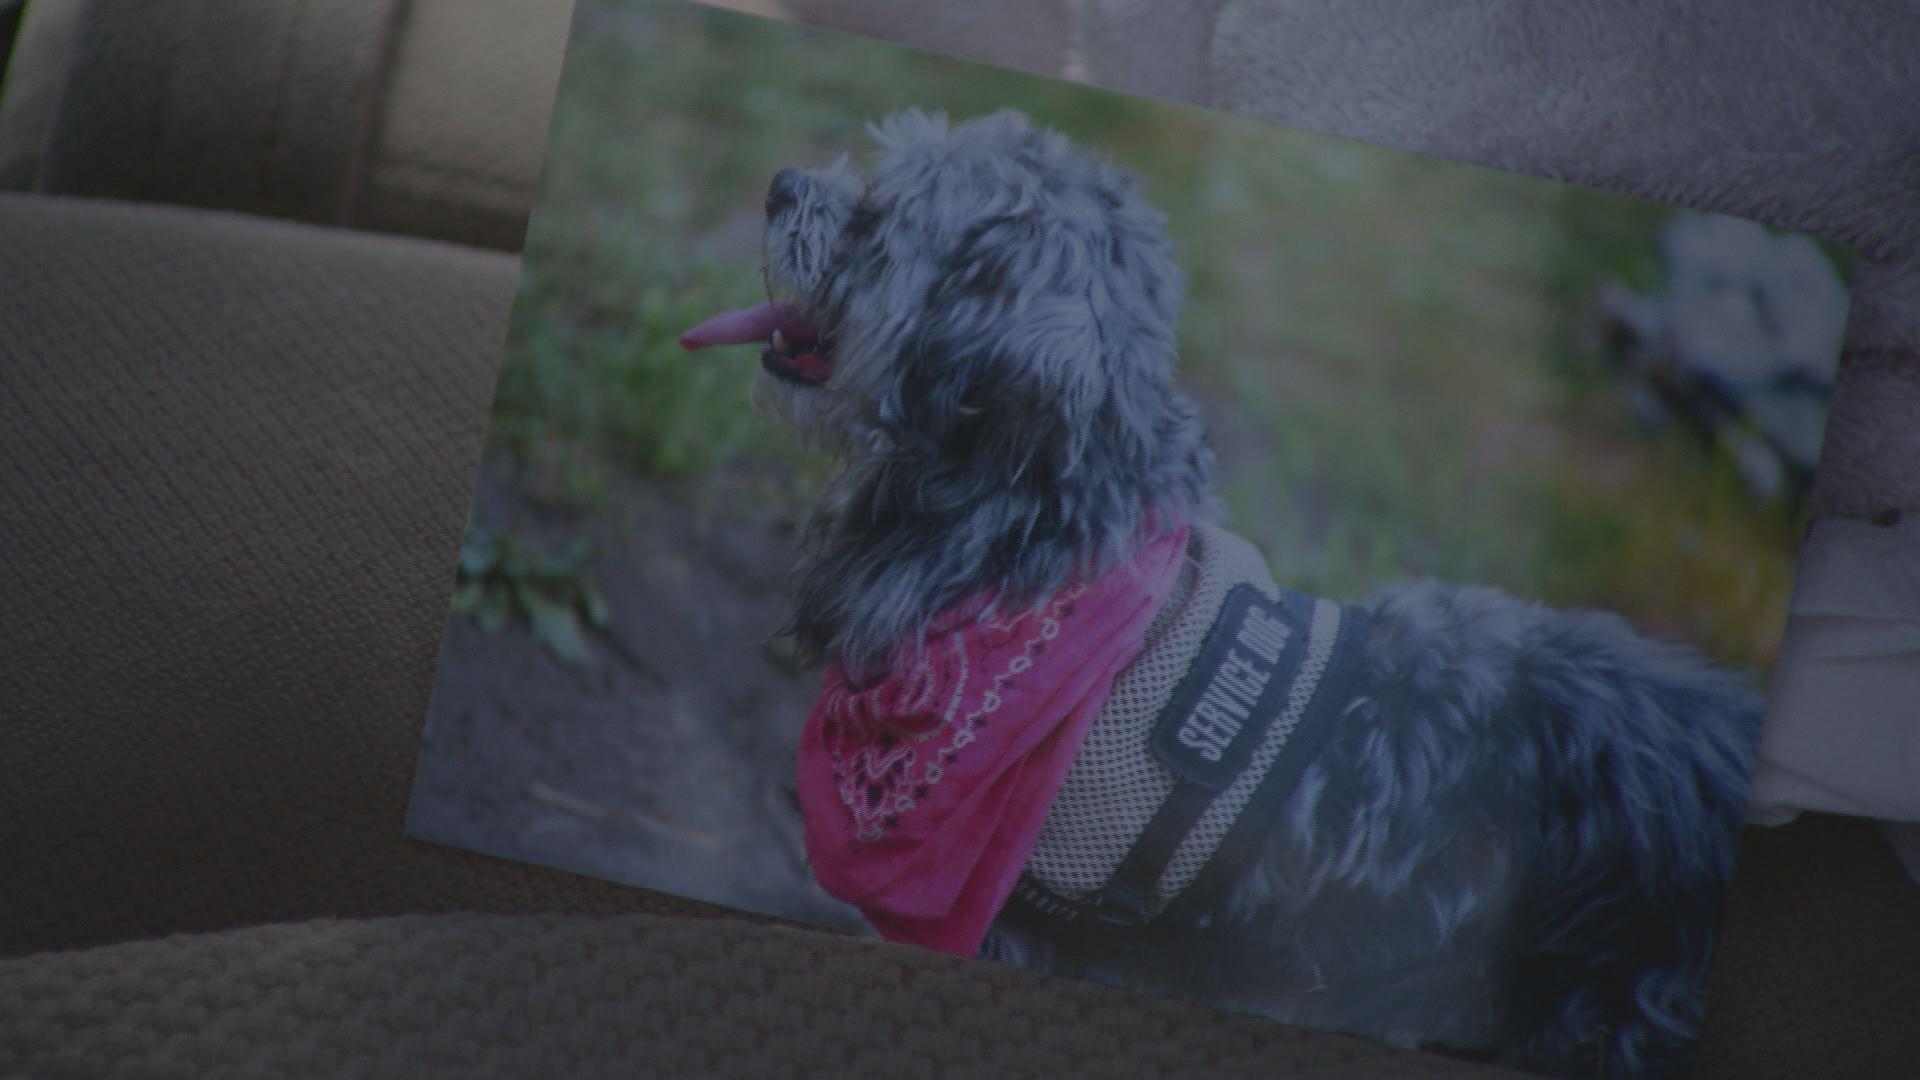 Service dog stolen from Vietnam Veteran